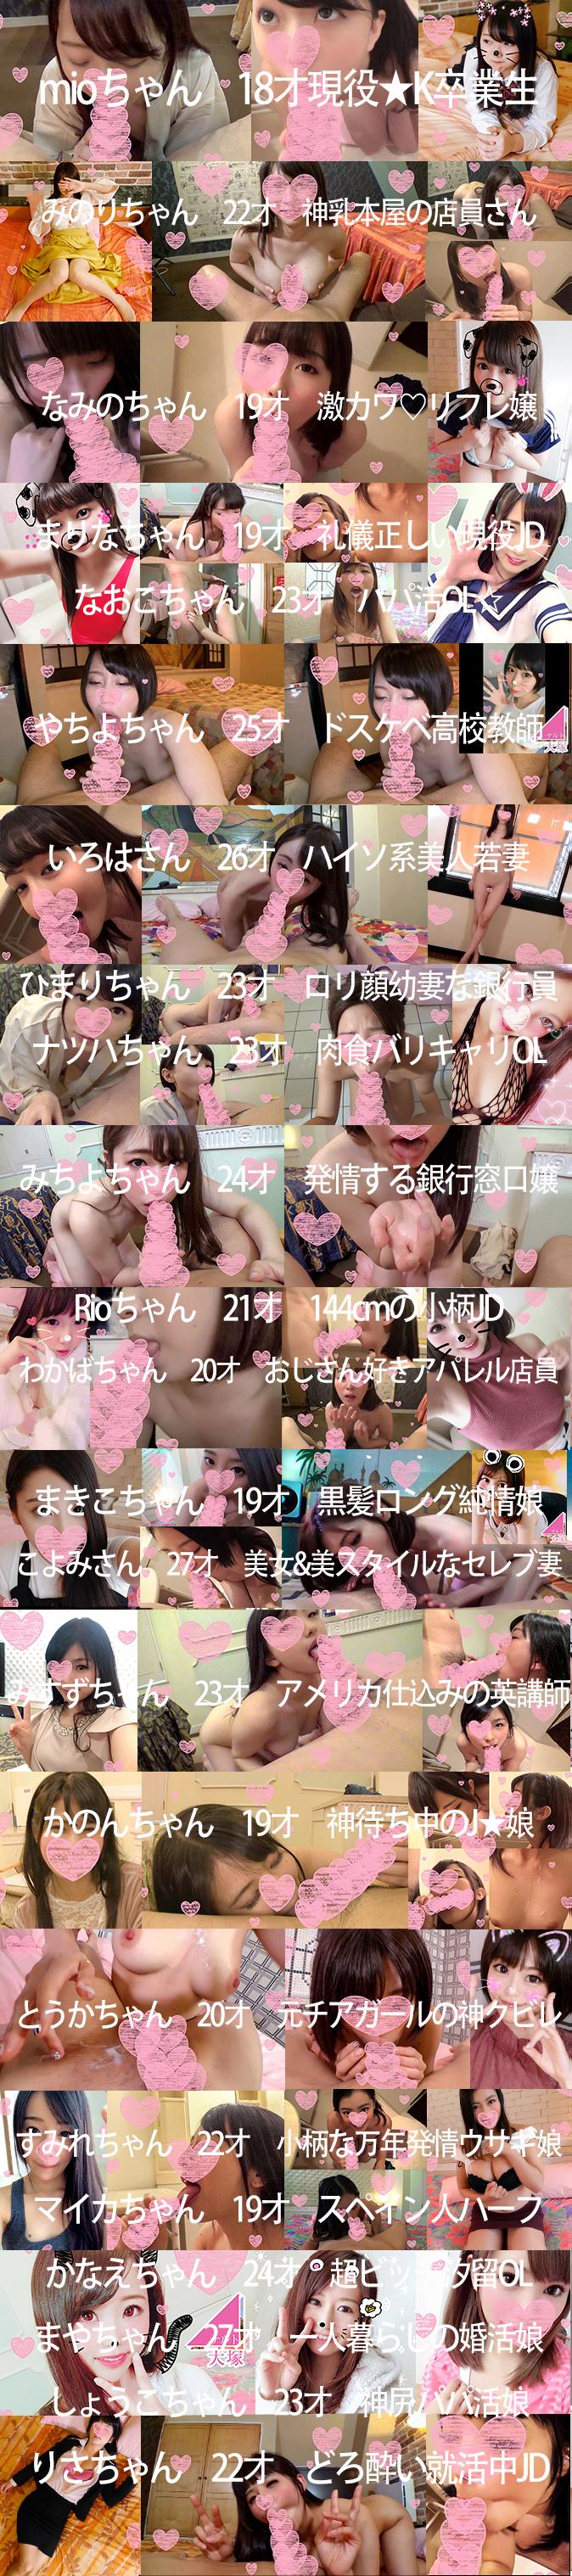 fellamatome_syoukai2.jpg